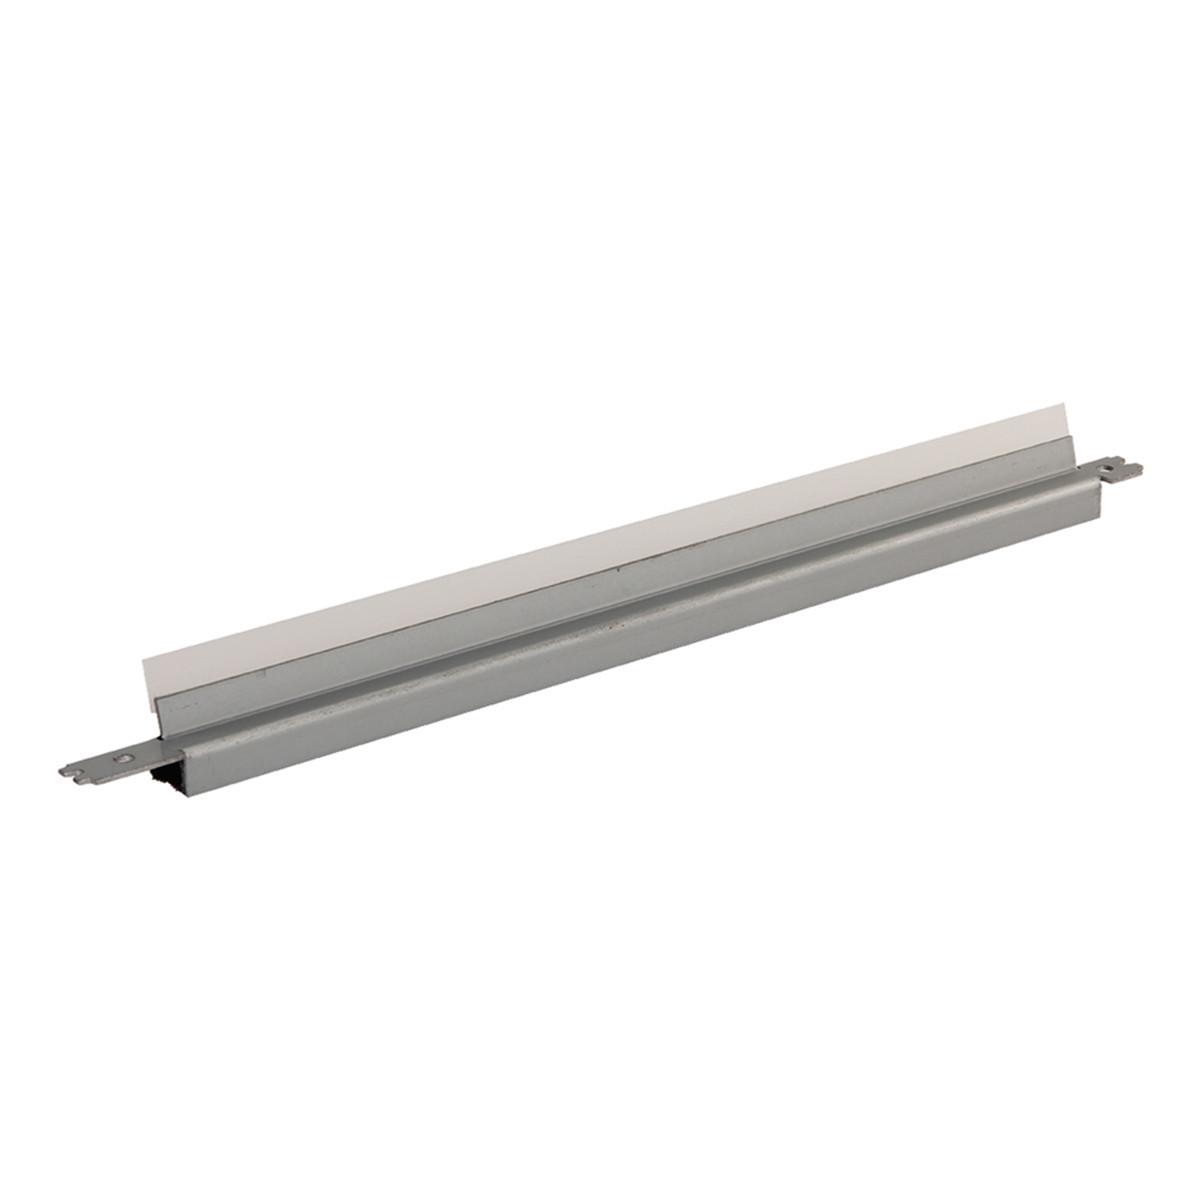 Lâmina de Limpeza ou Wiper Blade Cilindro Samsung SCX 4300 | MLT-D109S